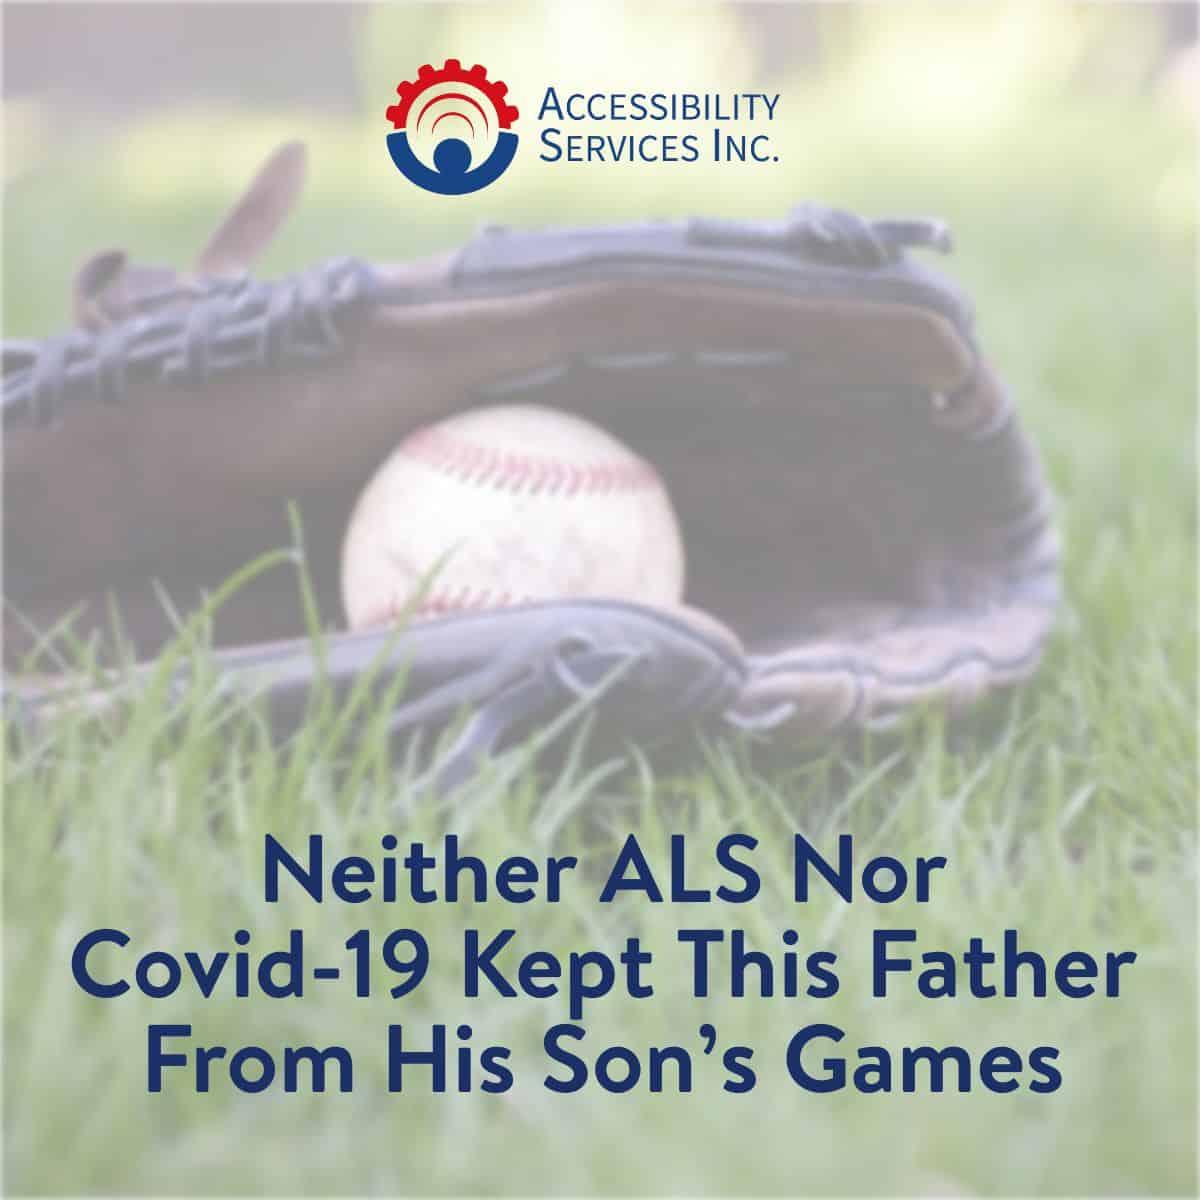 Neither ALS Nor Covid-19